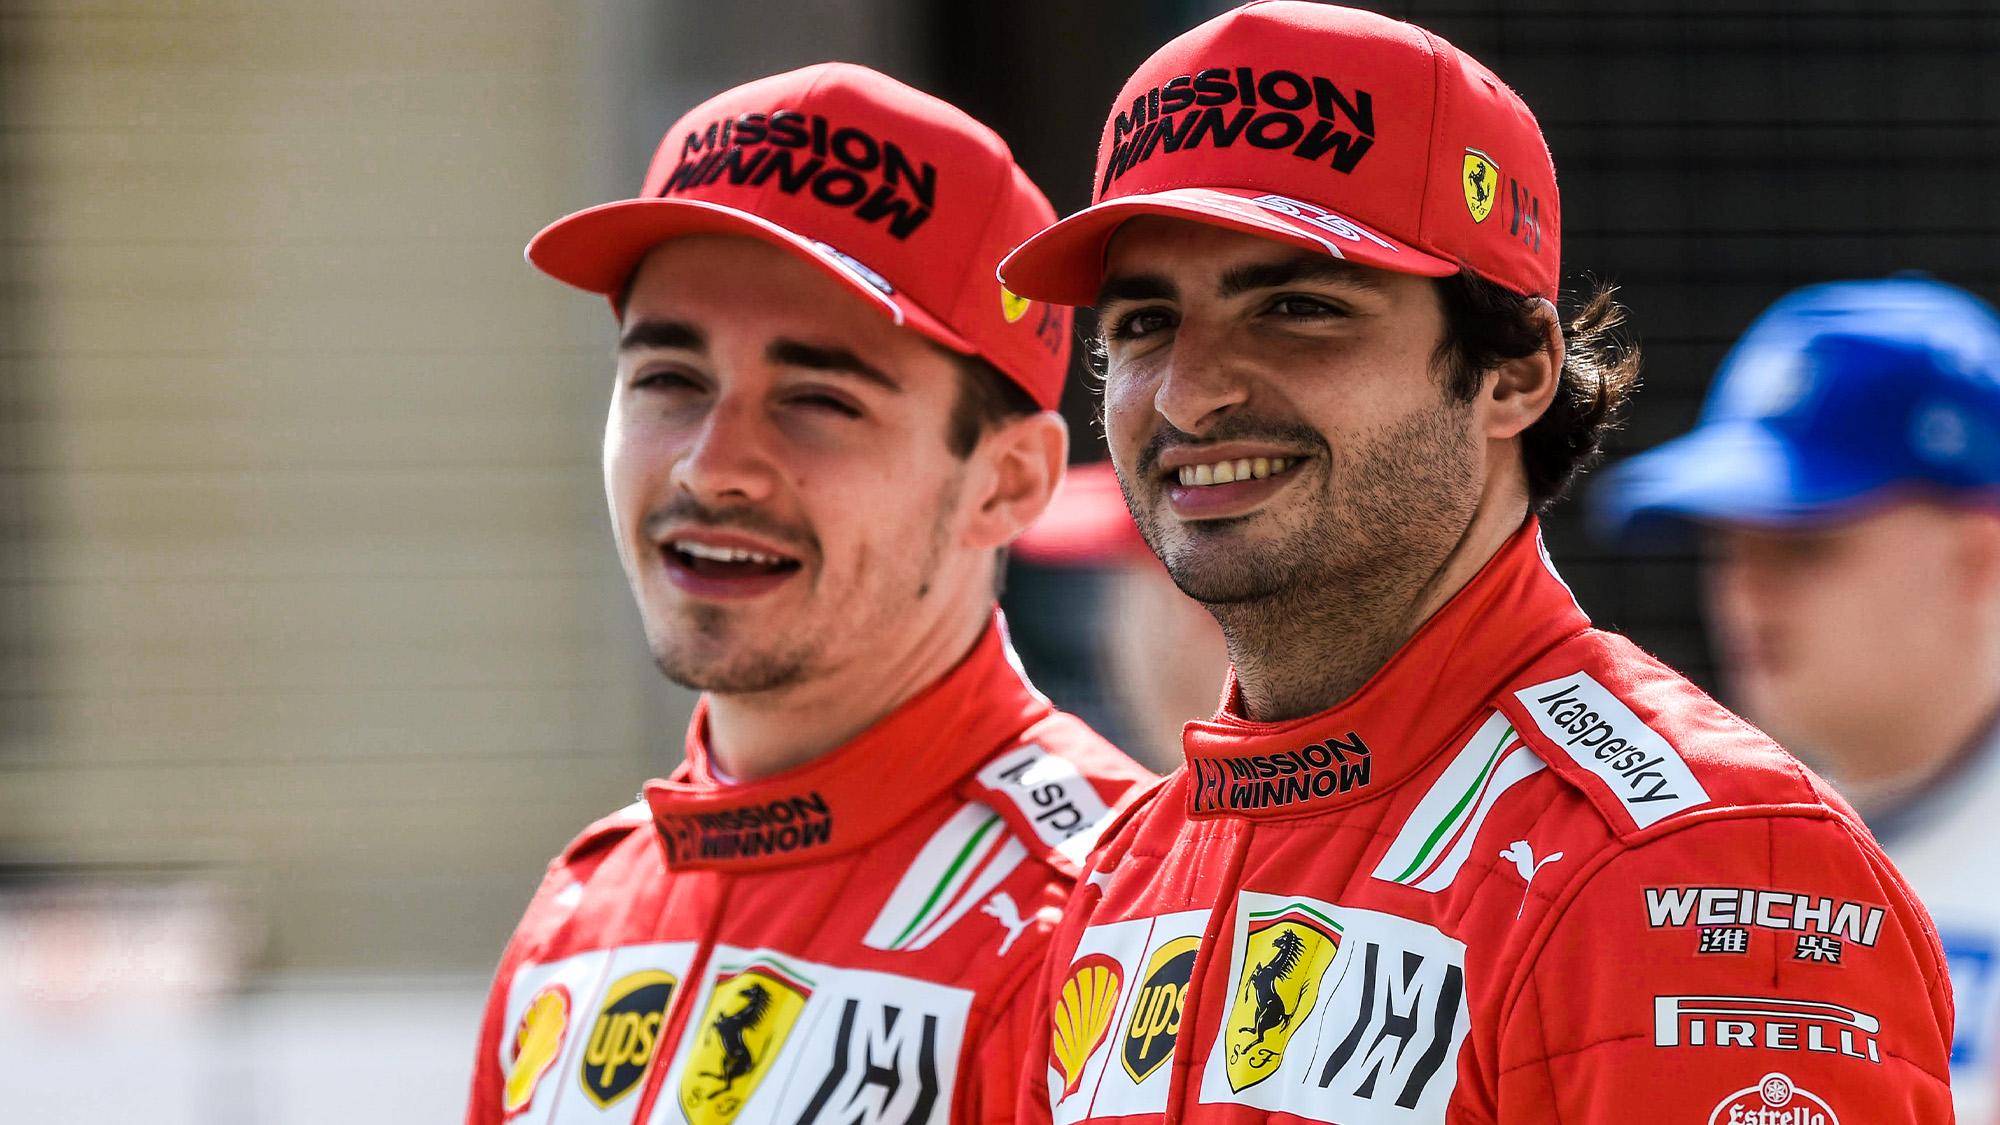 Charles Leclerc and Carlos Sainz ahead of the 2021 F1 season